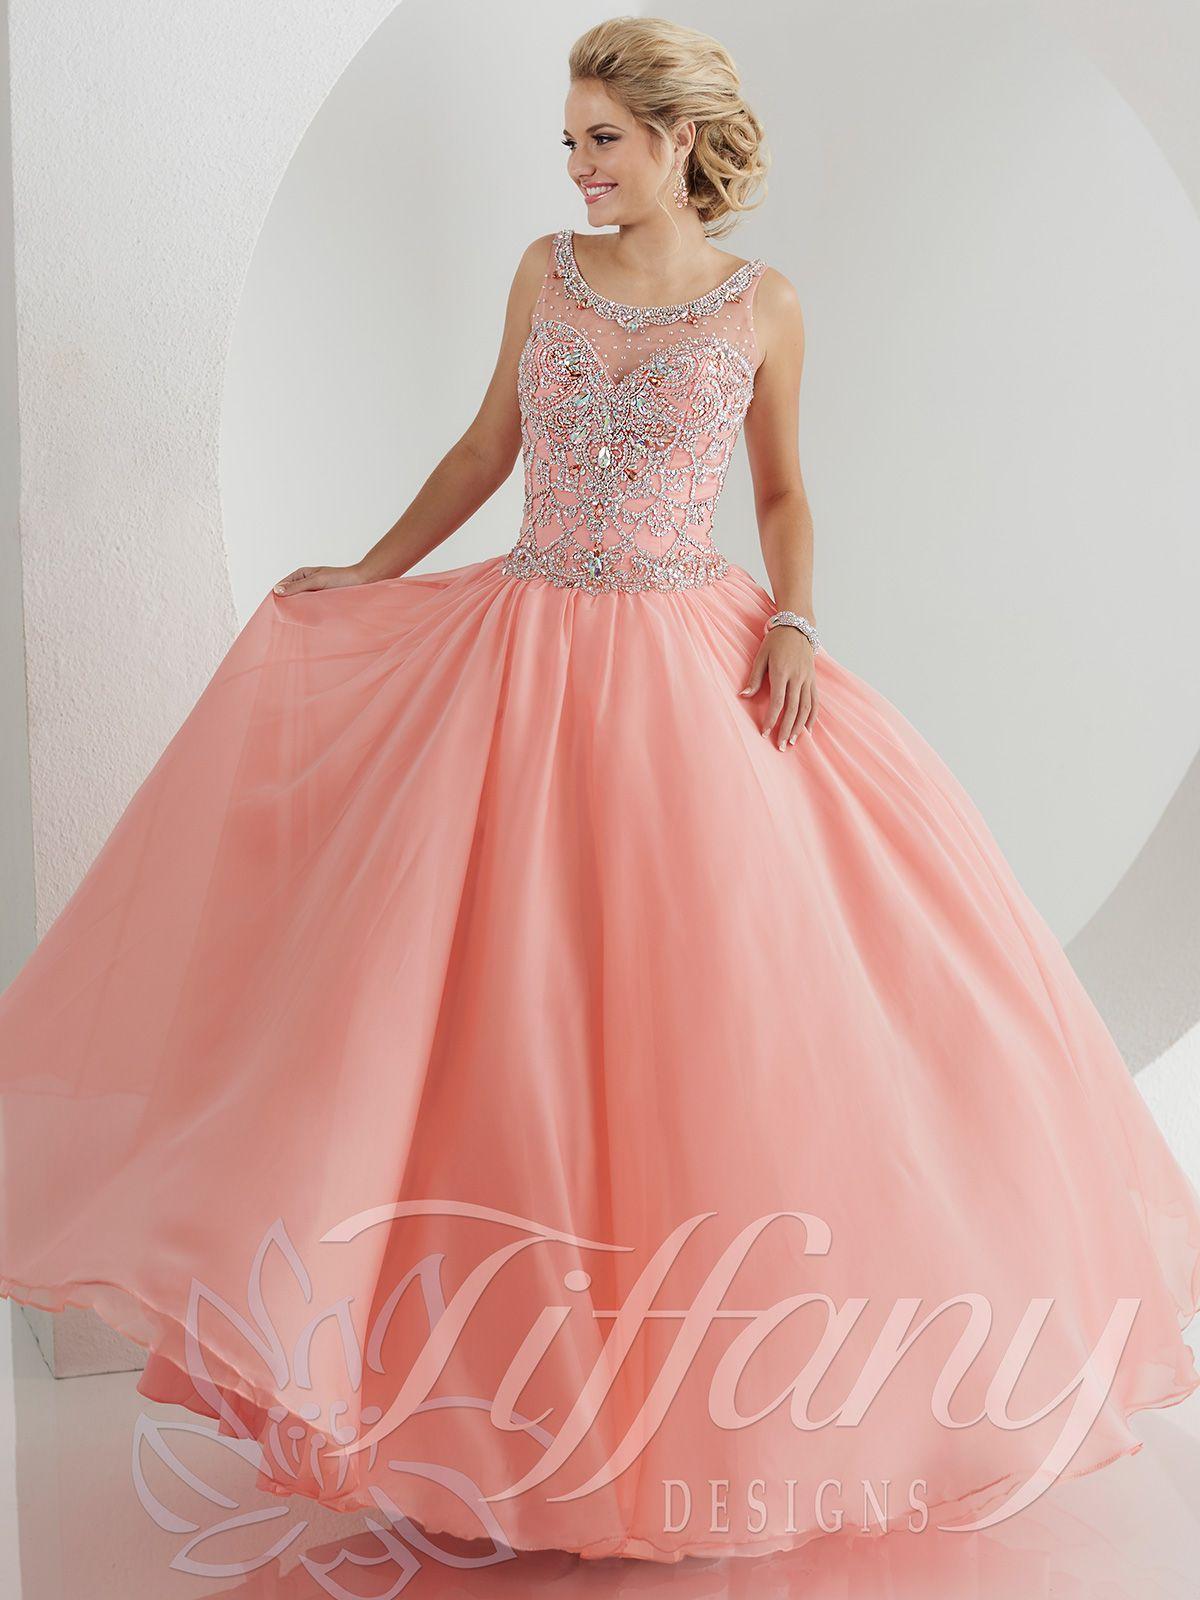 Tiffany Designs Ball Gowns | Western | Pinterest